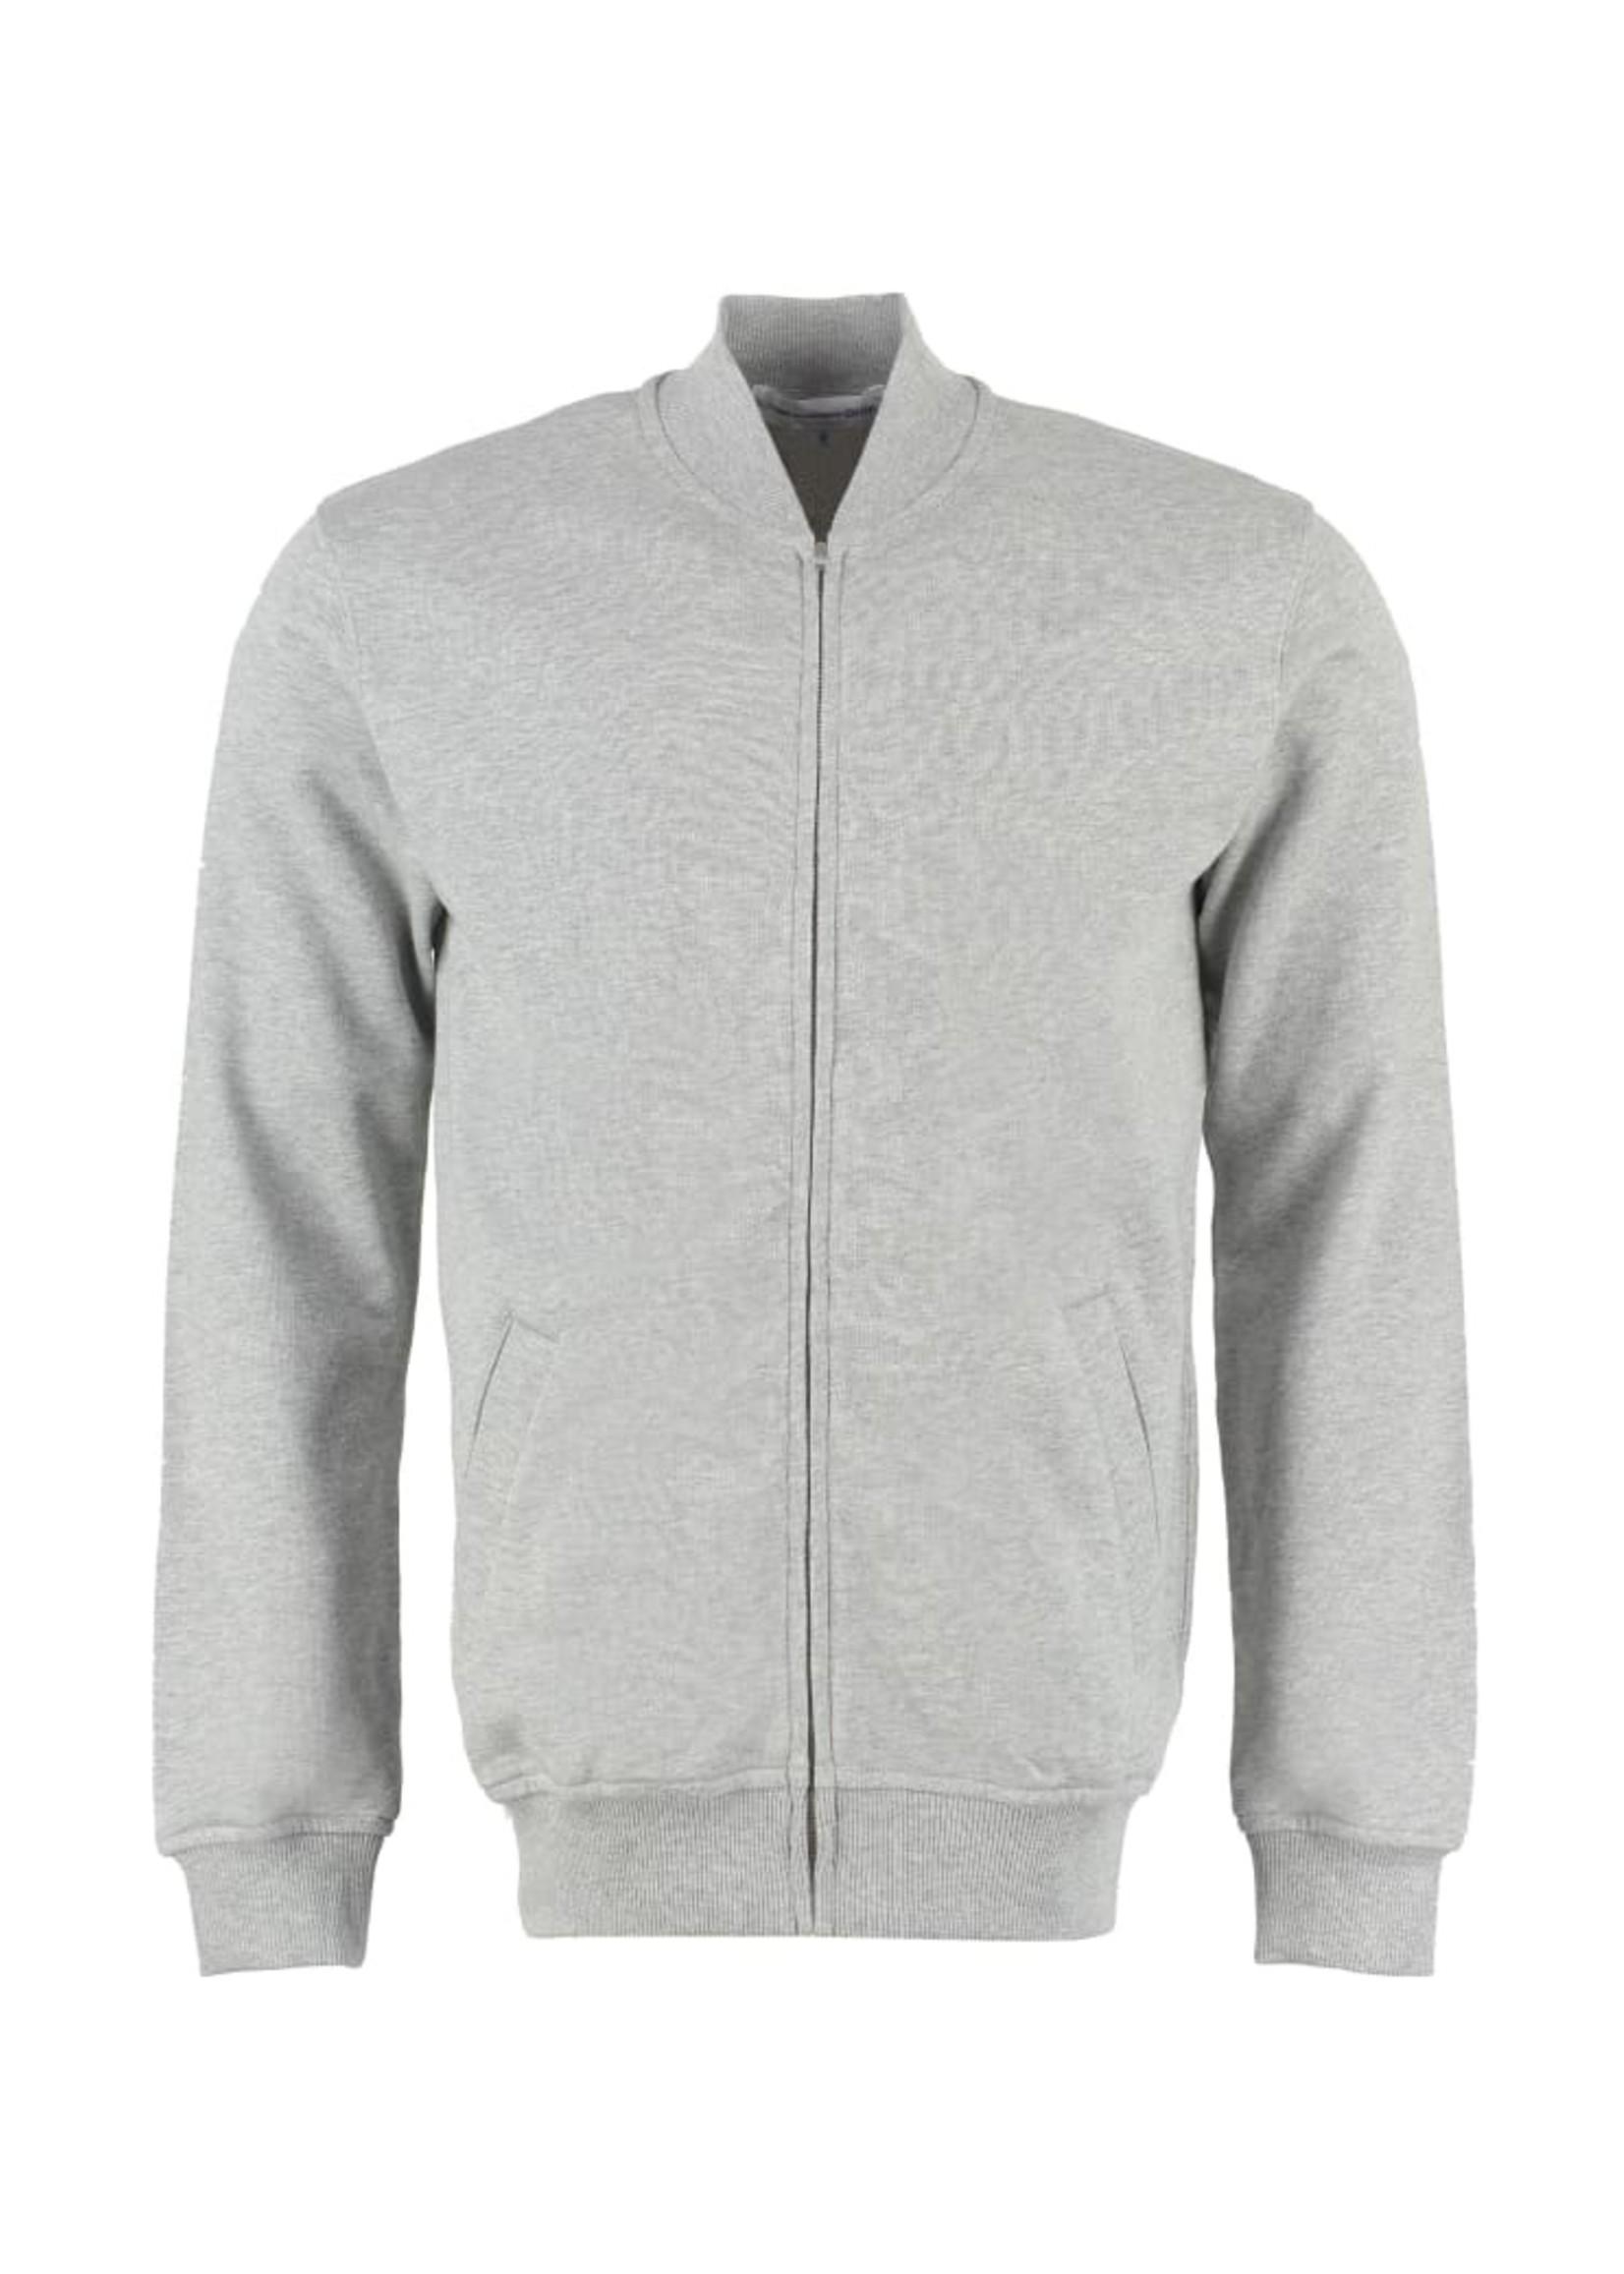 COMME des GARÇONS SHIRT CDG X KAWS Logo Zip Up Jacket